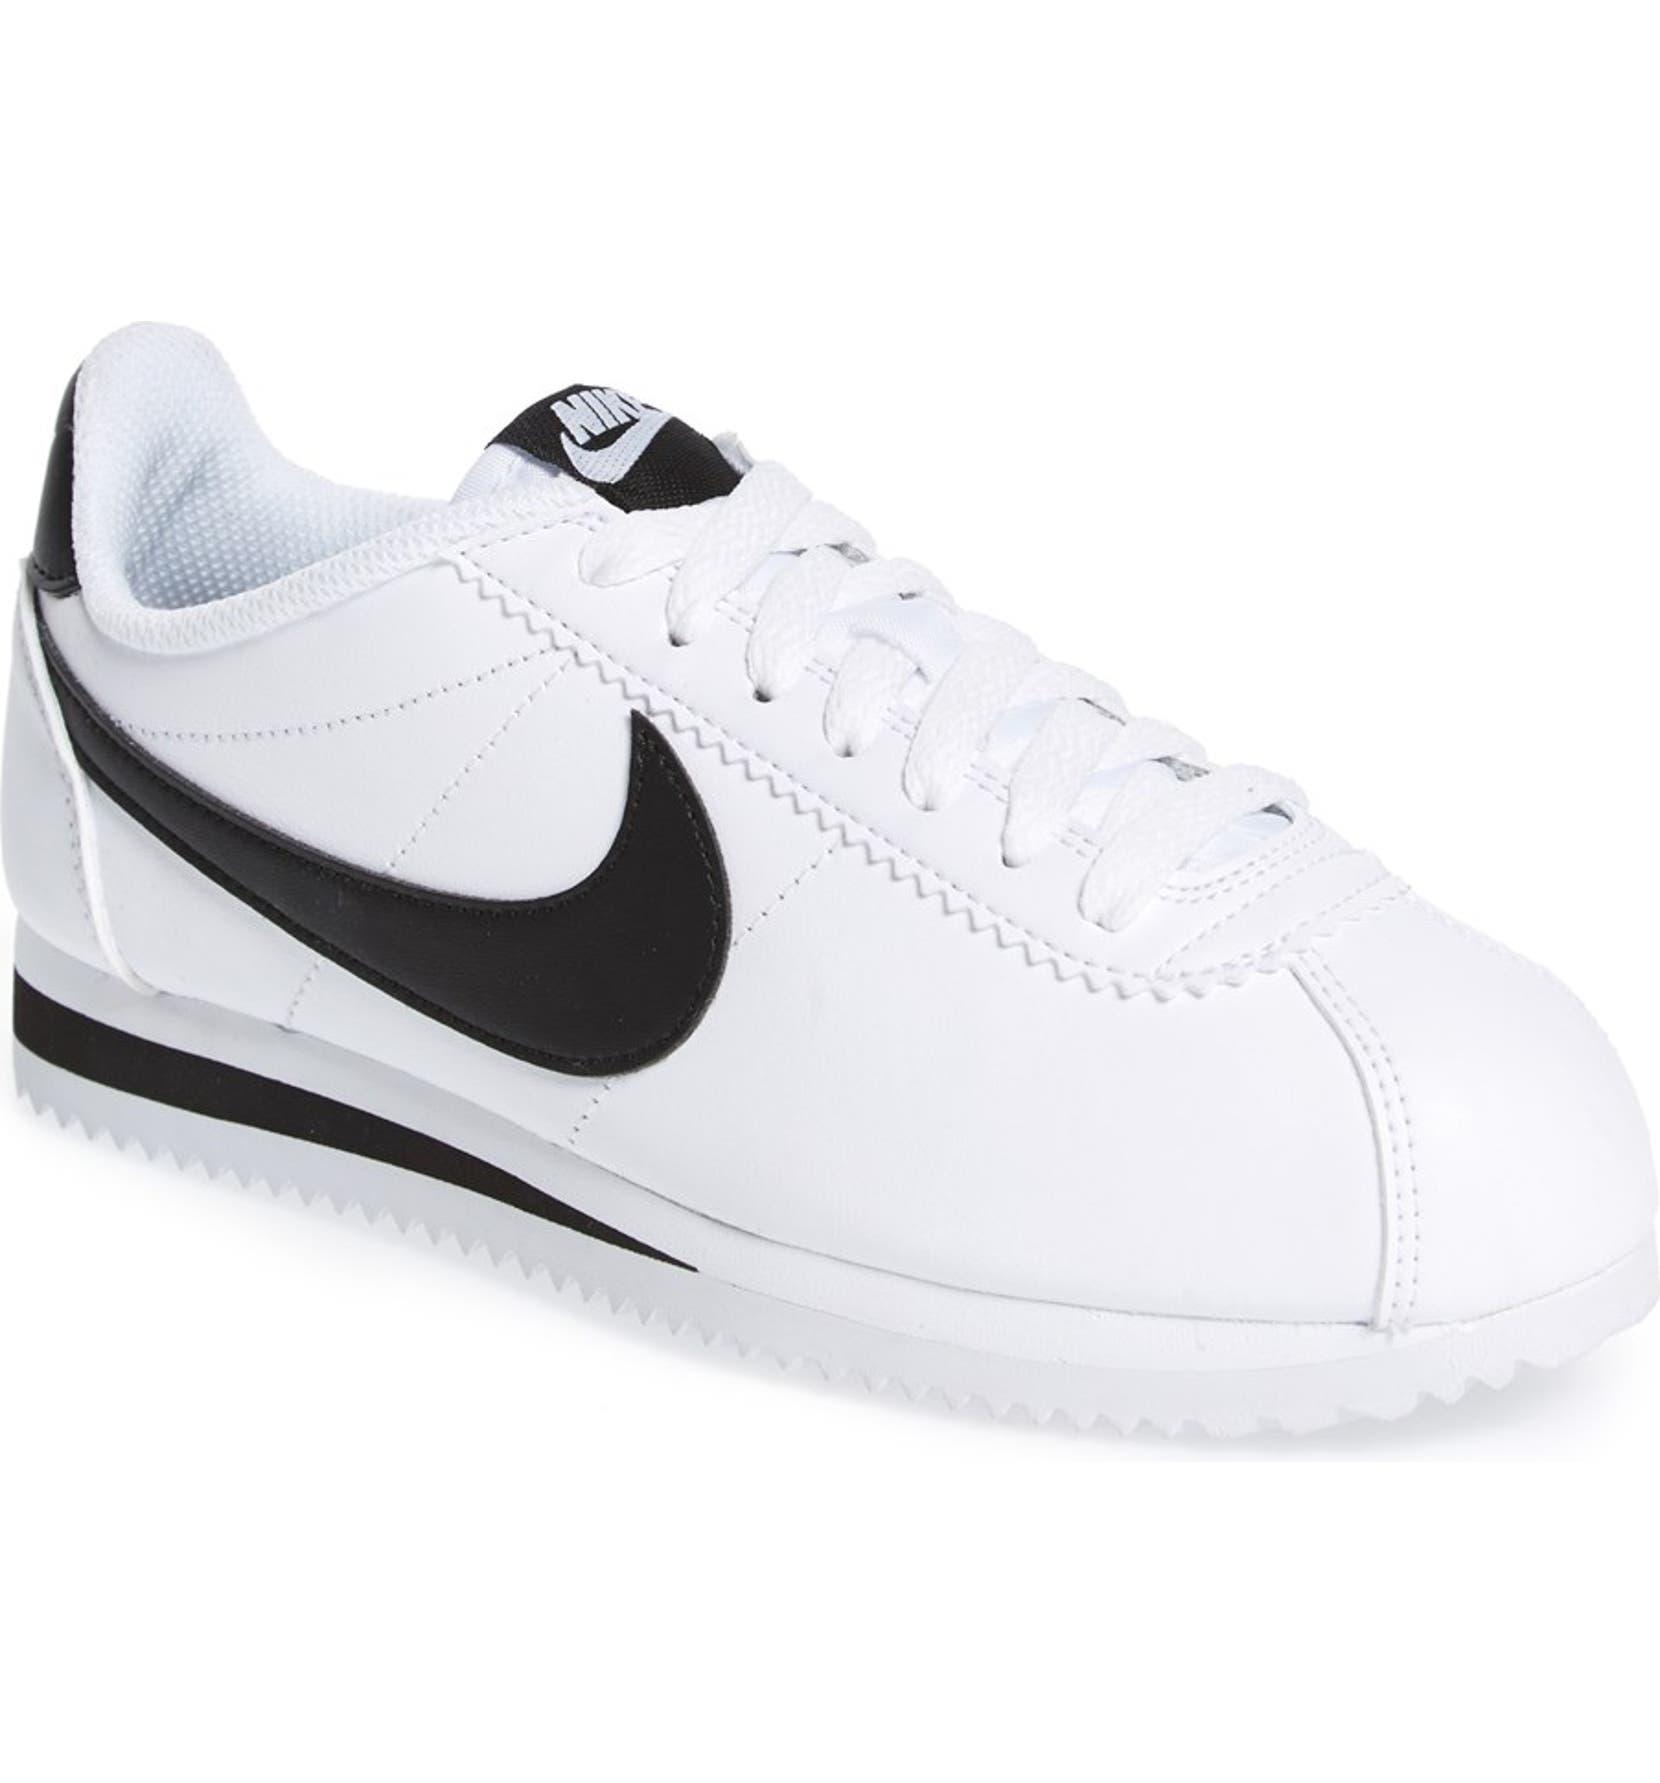 SneakerwomenNordstrom Cortez Nike Cortez Classic Classic Nike Omw8nvN0